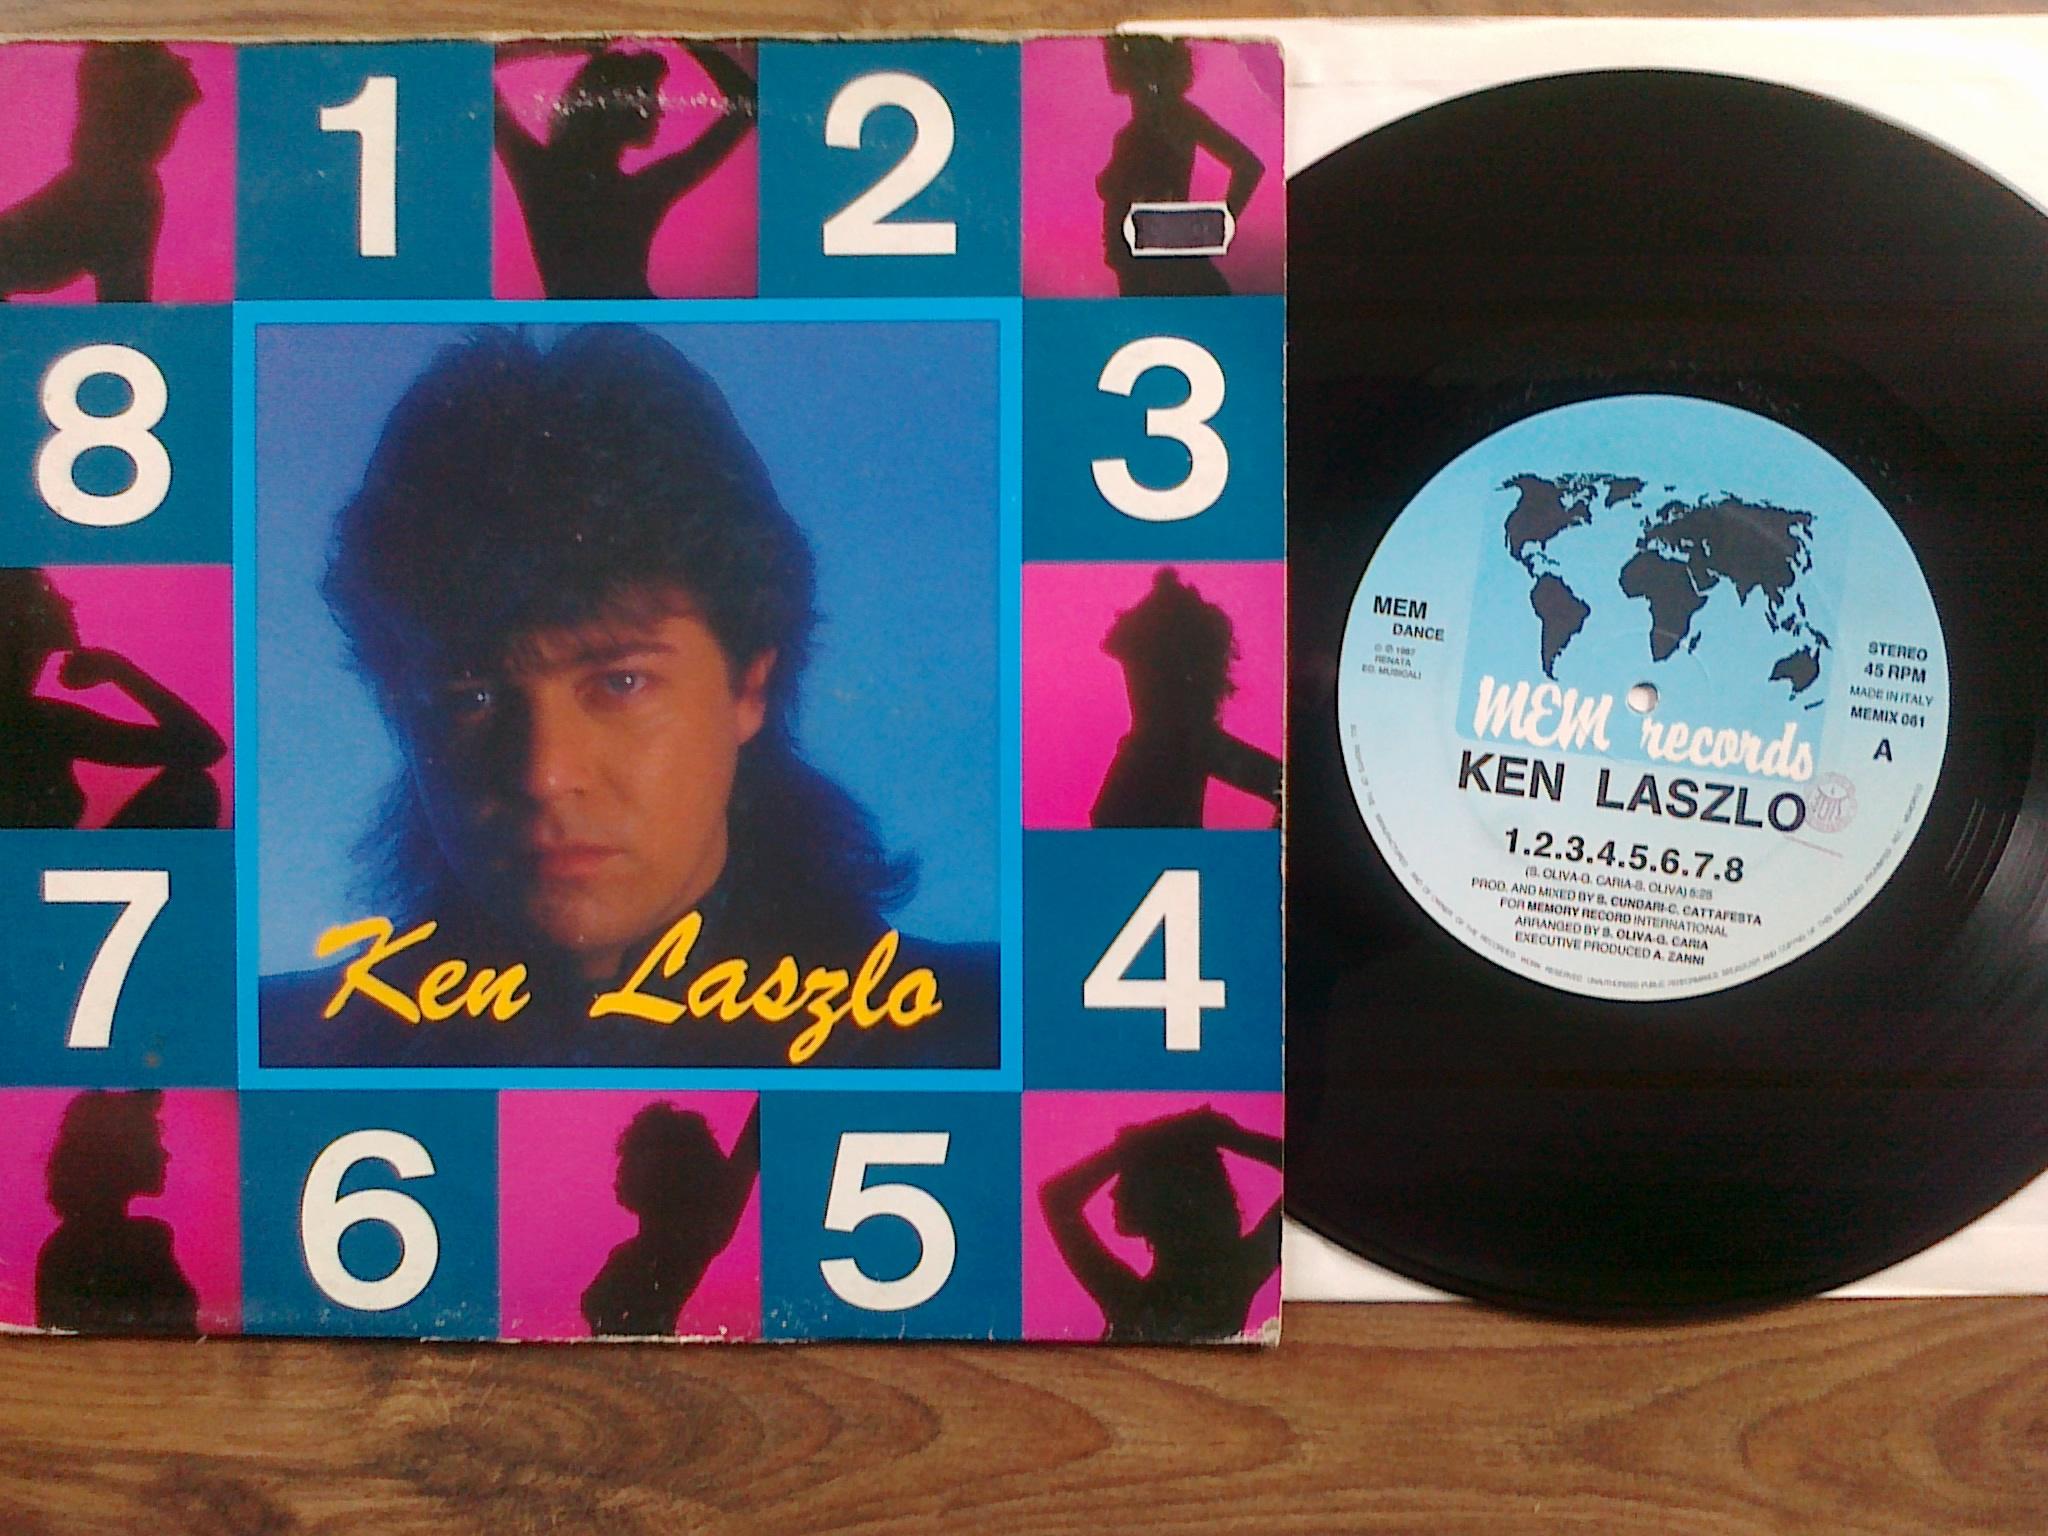 Ken Laszlo - 1.2.3.4.5.6.7.8